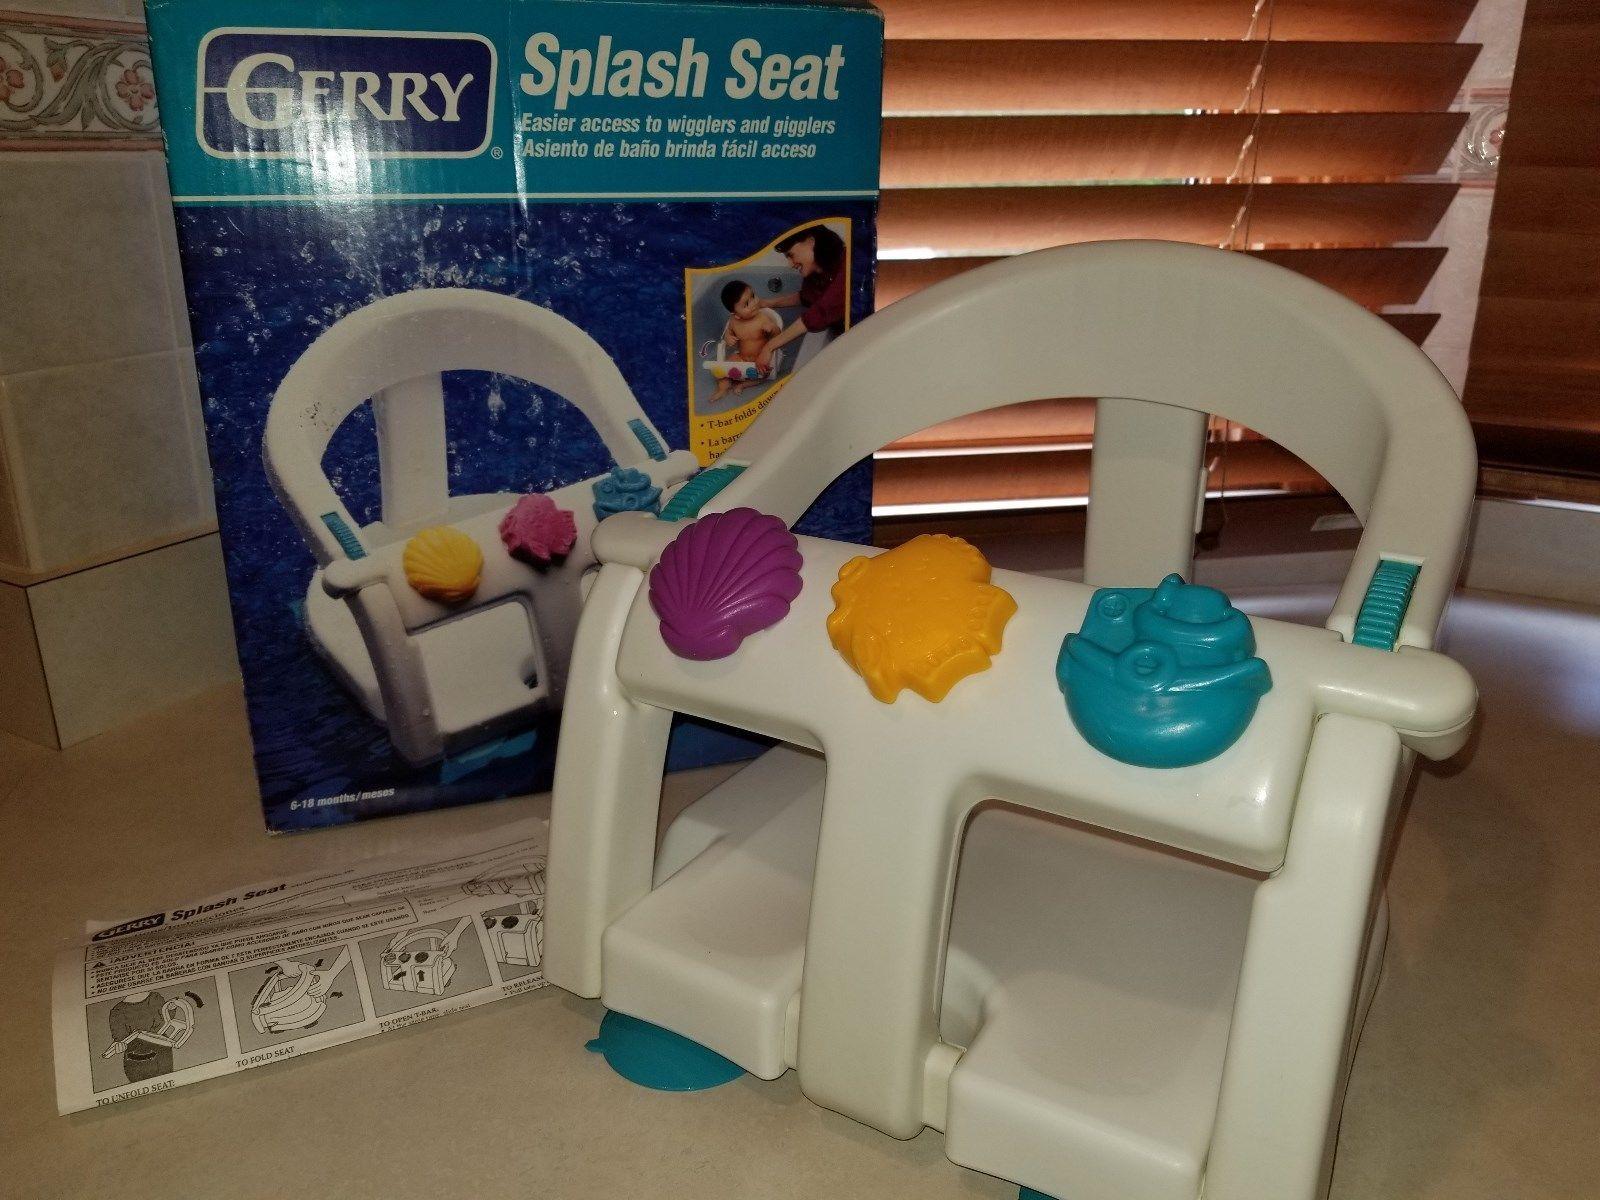 Gerry Splash Baby Bath Seat Tub Ring Suction Cup Chair Toy Bar Folds ...